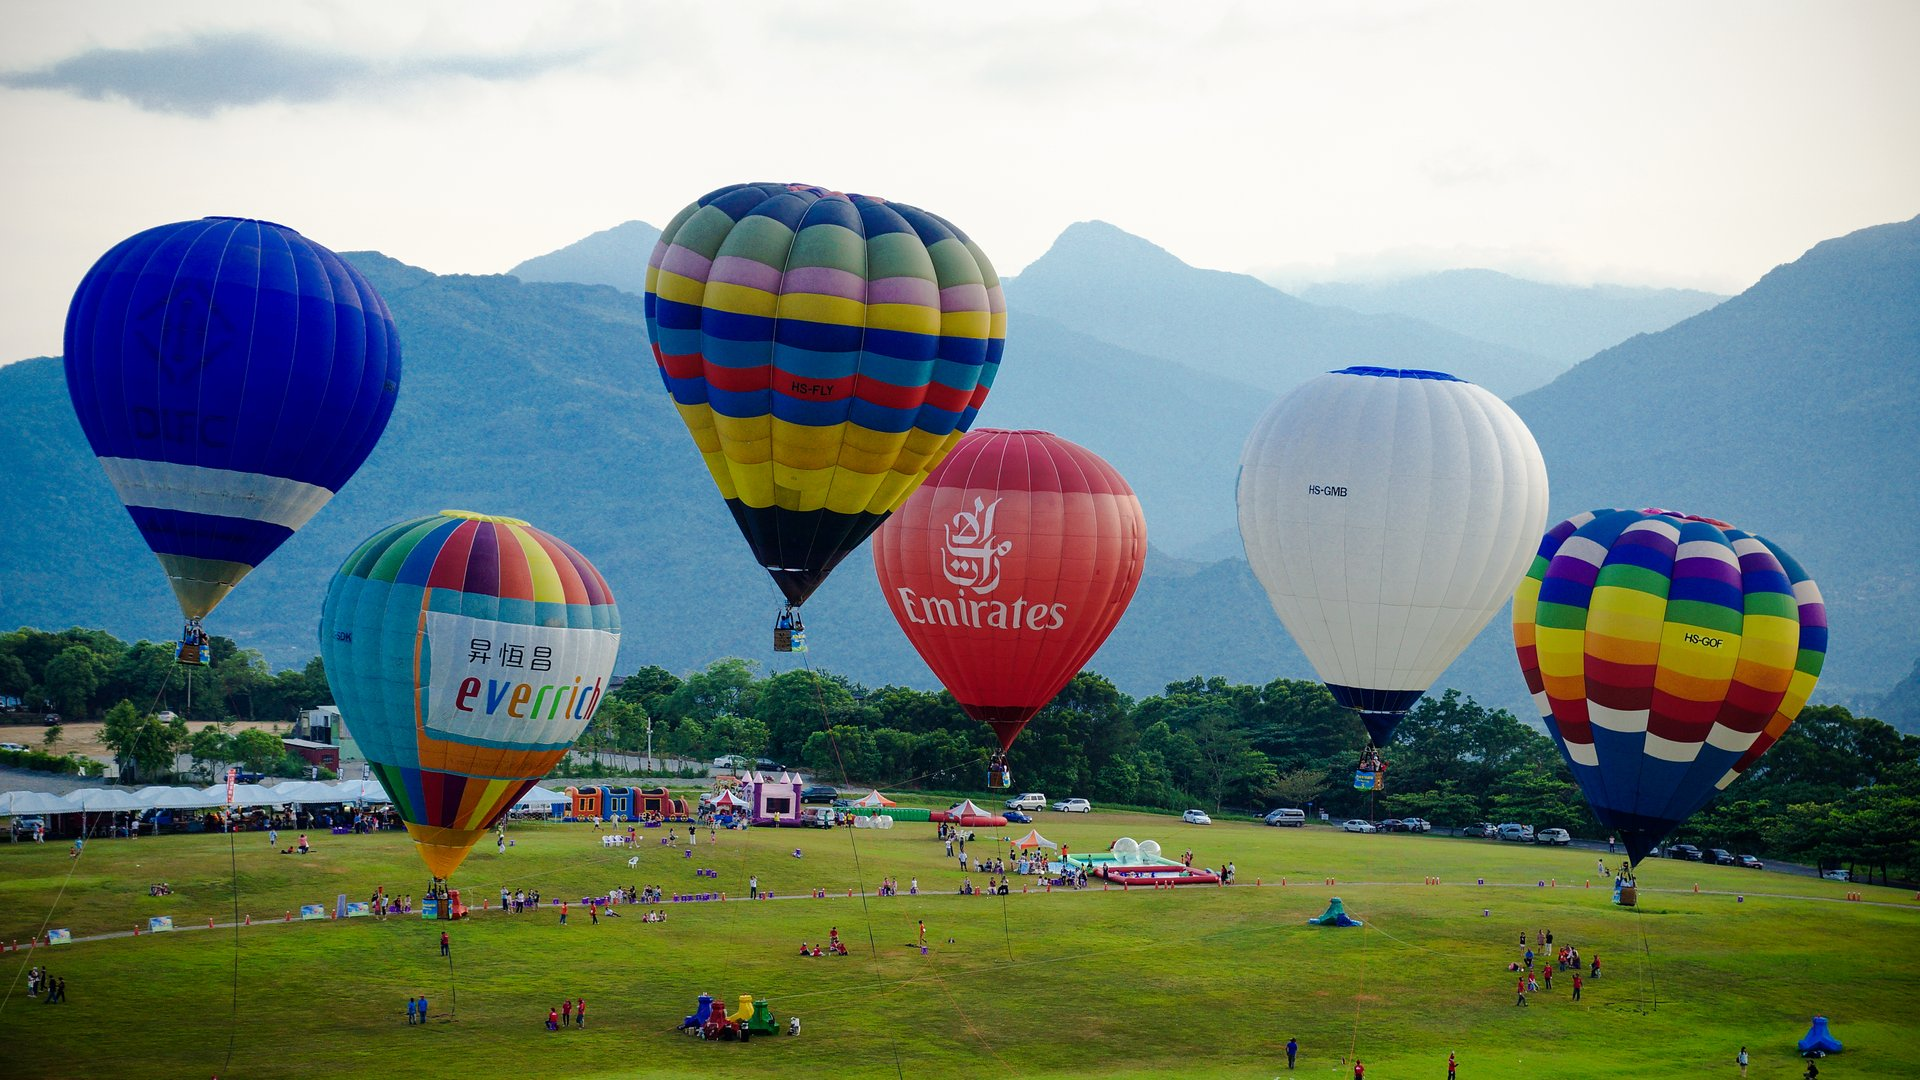 Taiwan Balloon Festival in Taiwan - Best Time